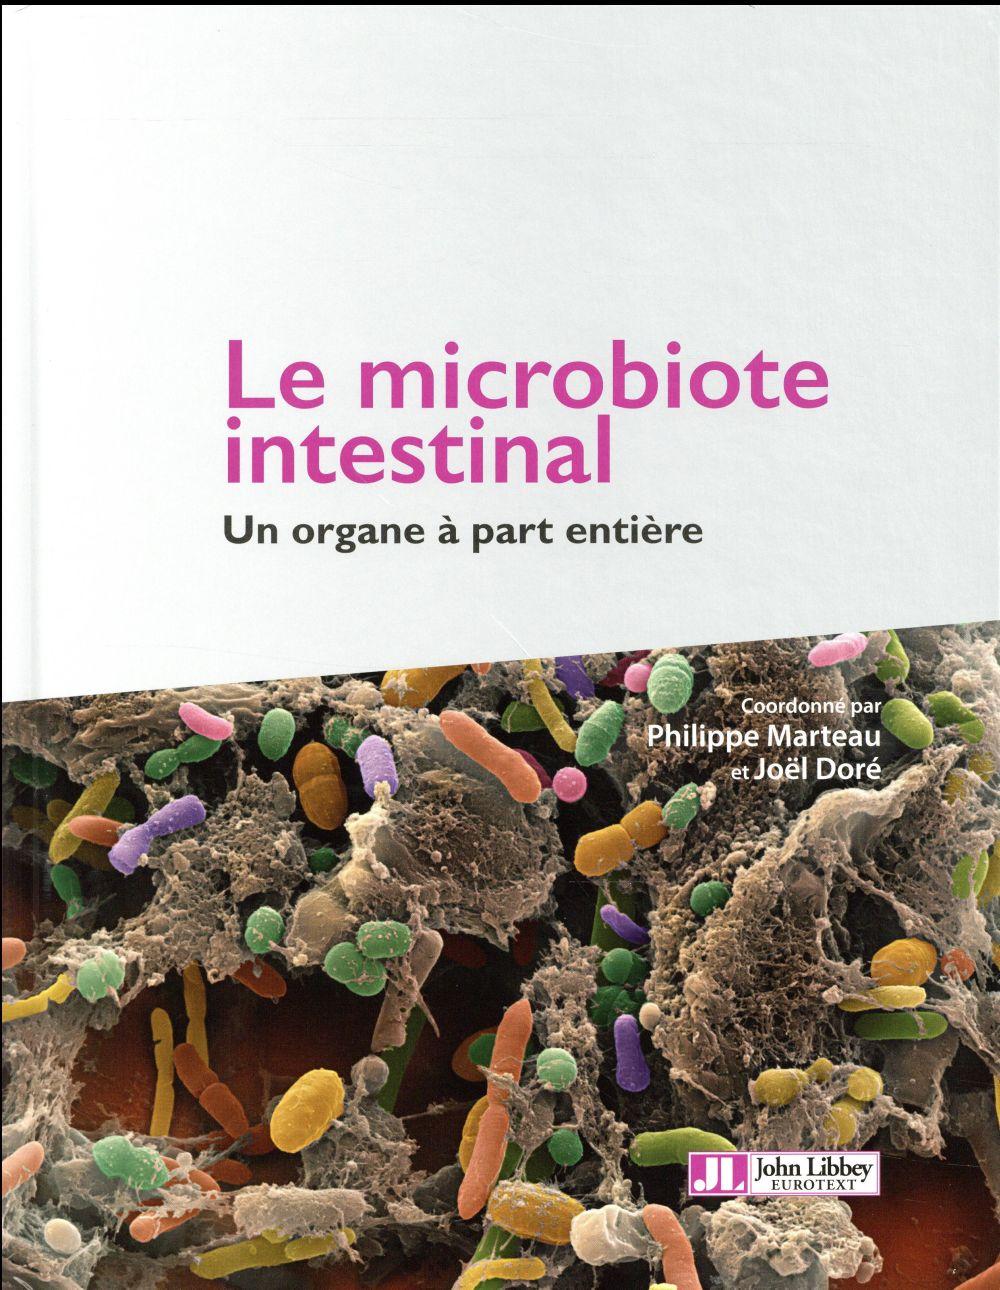 LE MICROBIOTE INTESTINAL - UN ORGANE A PART ENTIERE